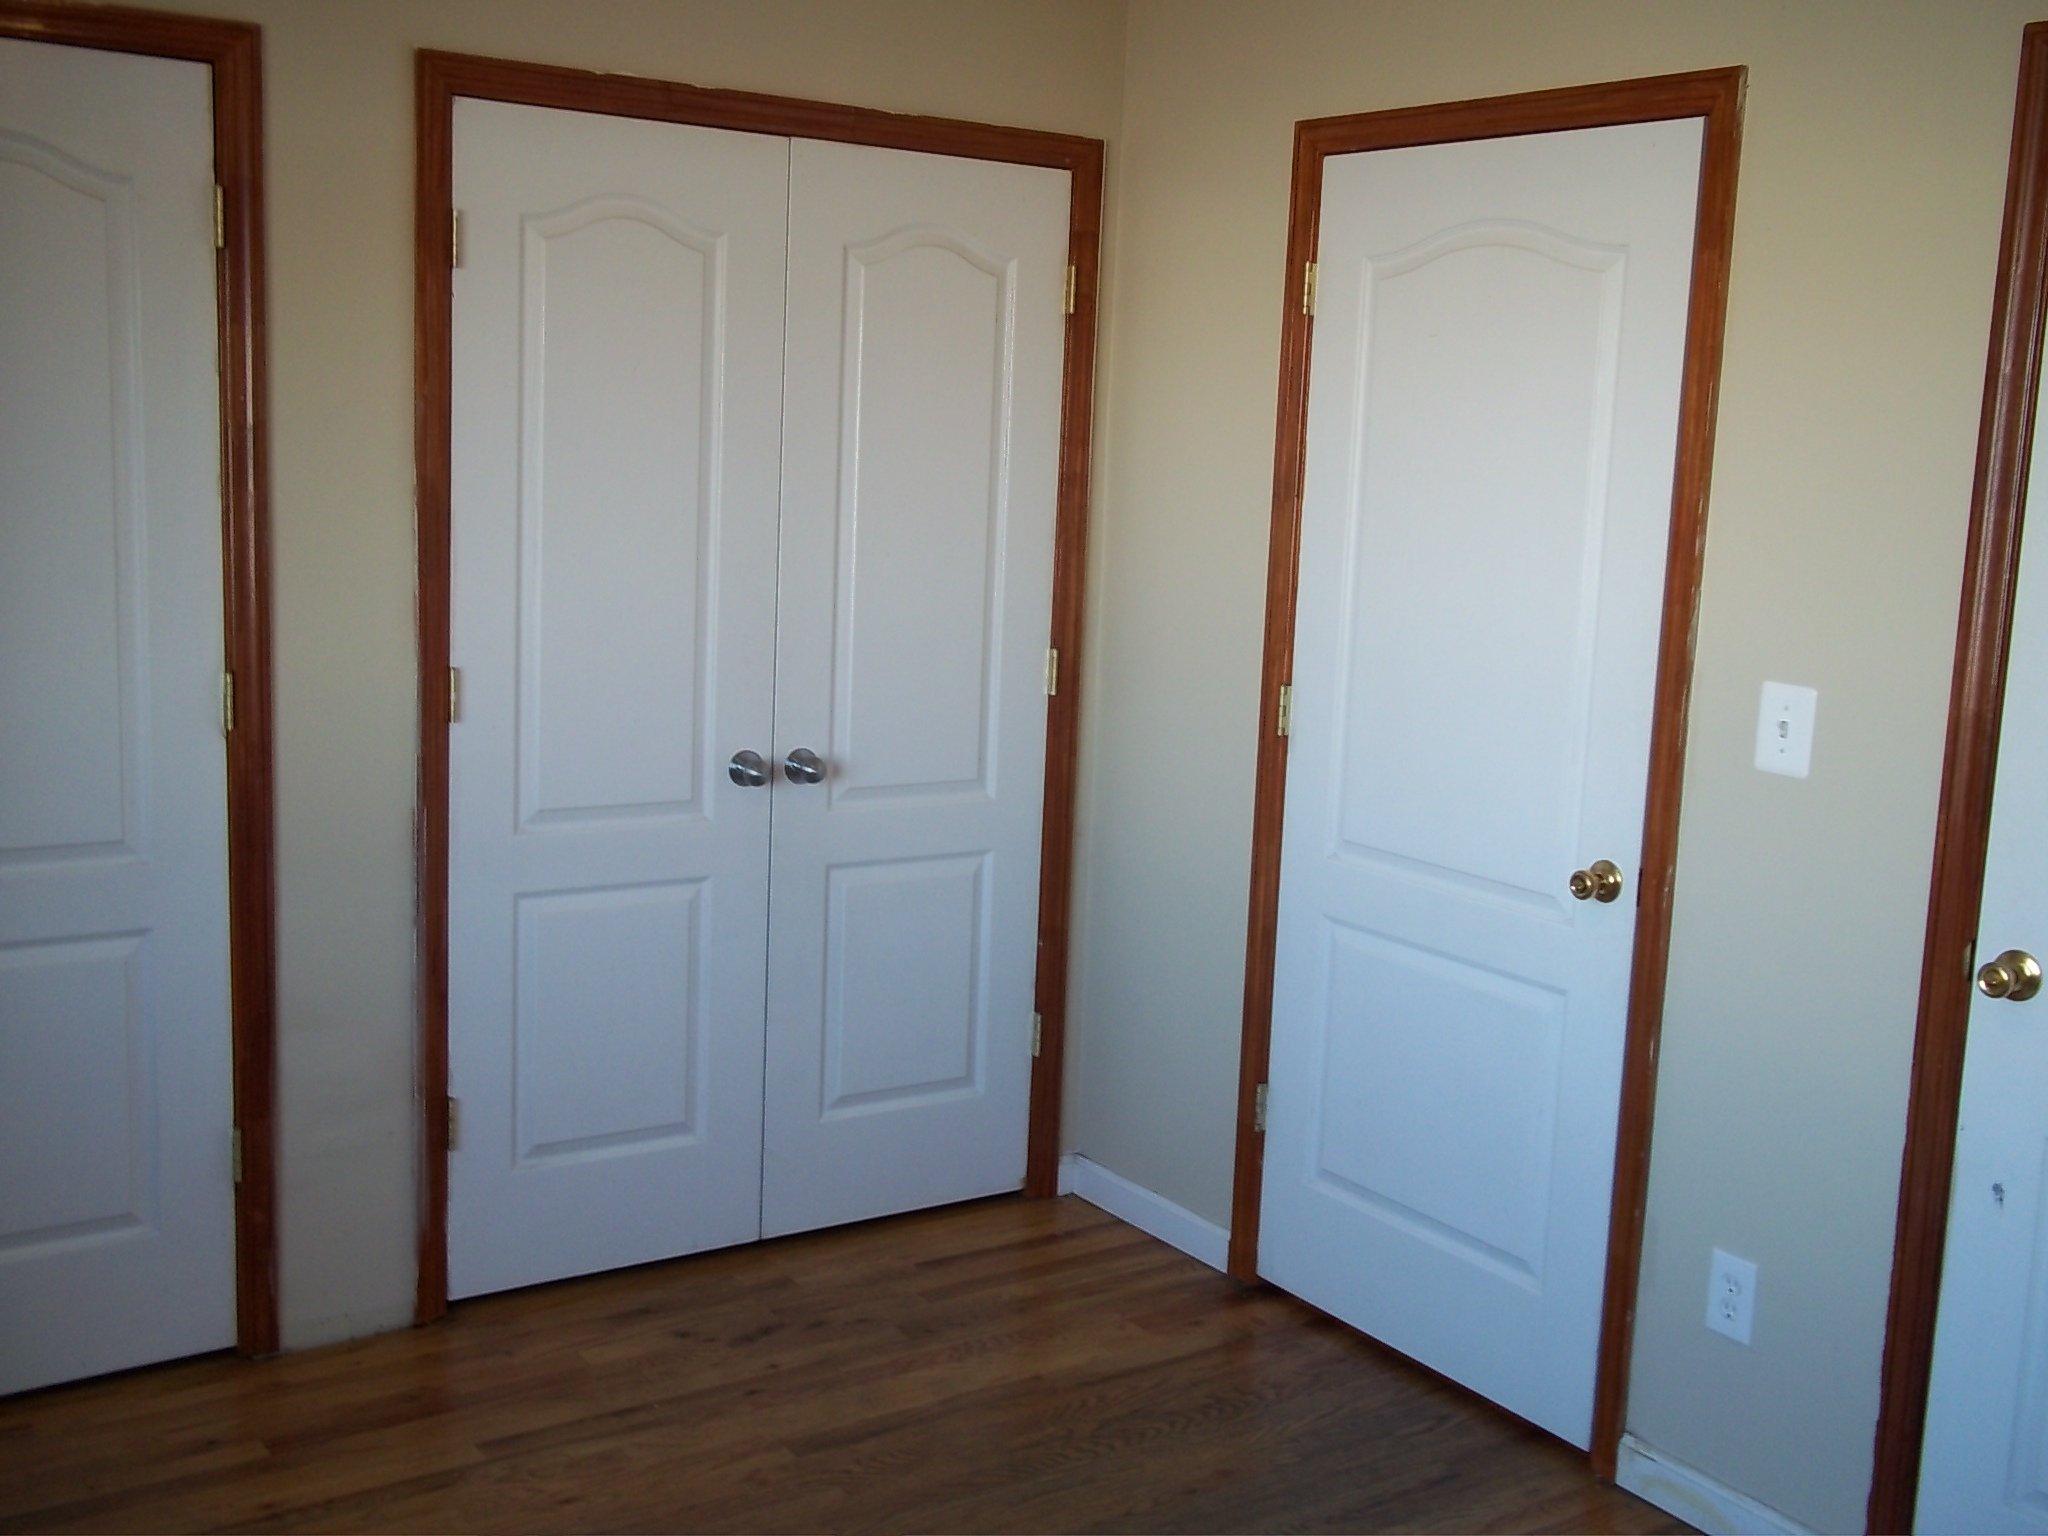 bedford stuyvesant 3 bedroom apartment for rent brooklyn